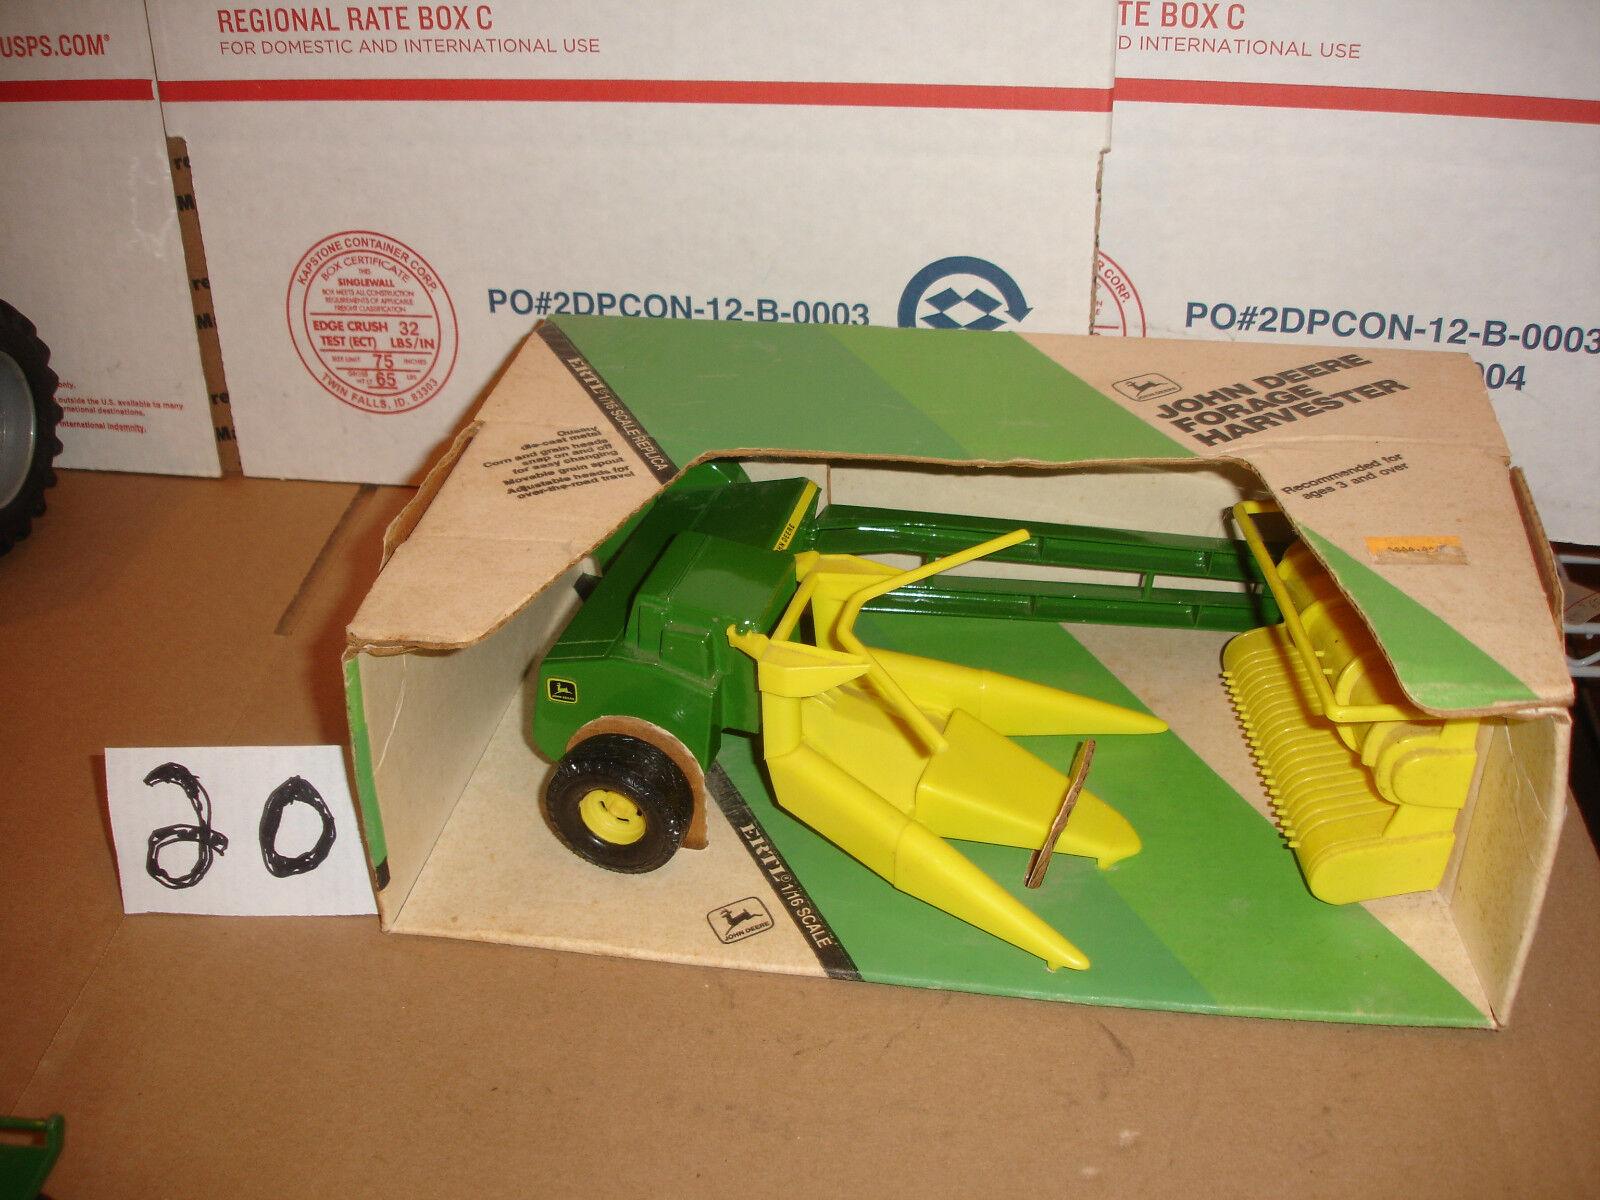 grandi prezzi scontati 1 16  john deere chopper in in in scatola  incredibili sconti